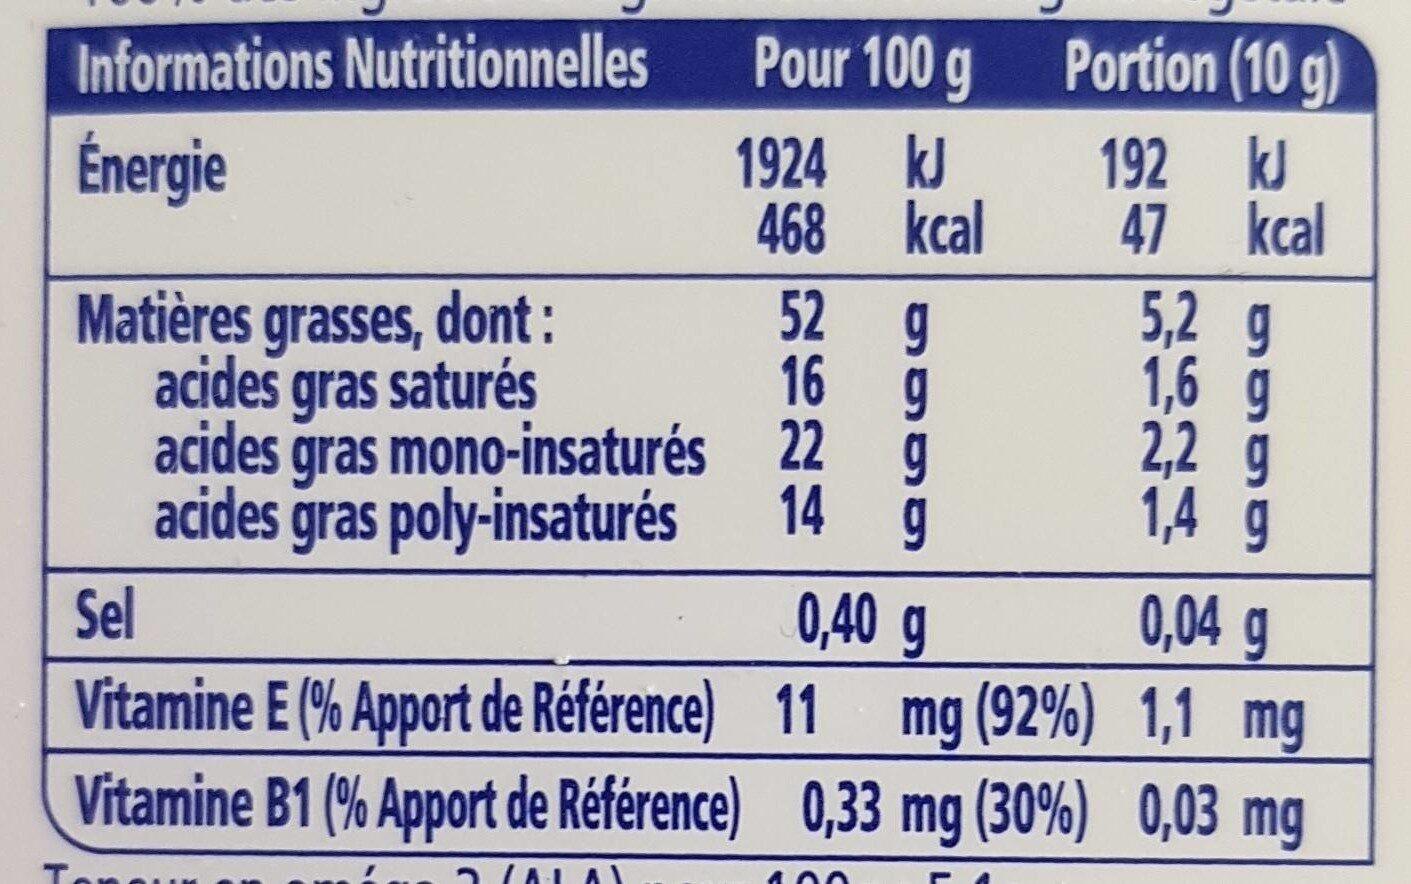 St Hubert oméga 3 - Valori nutrizionali - fr